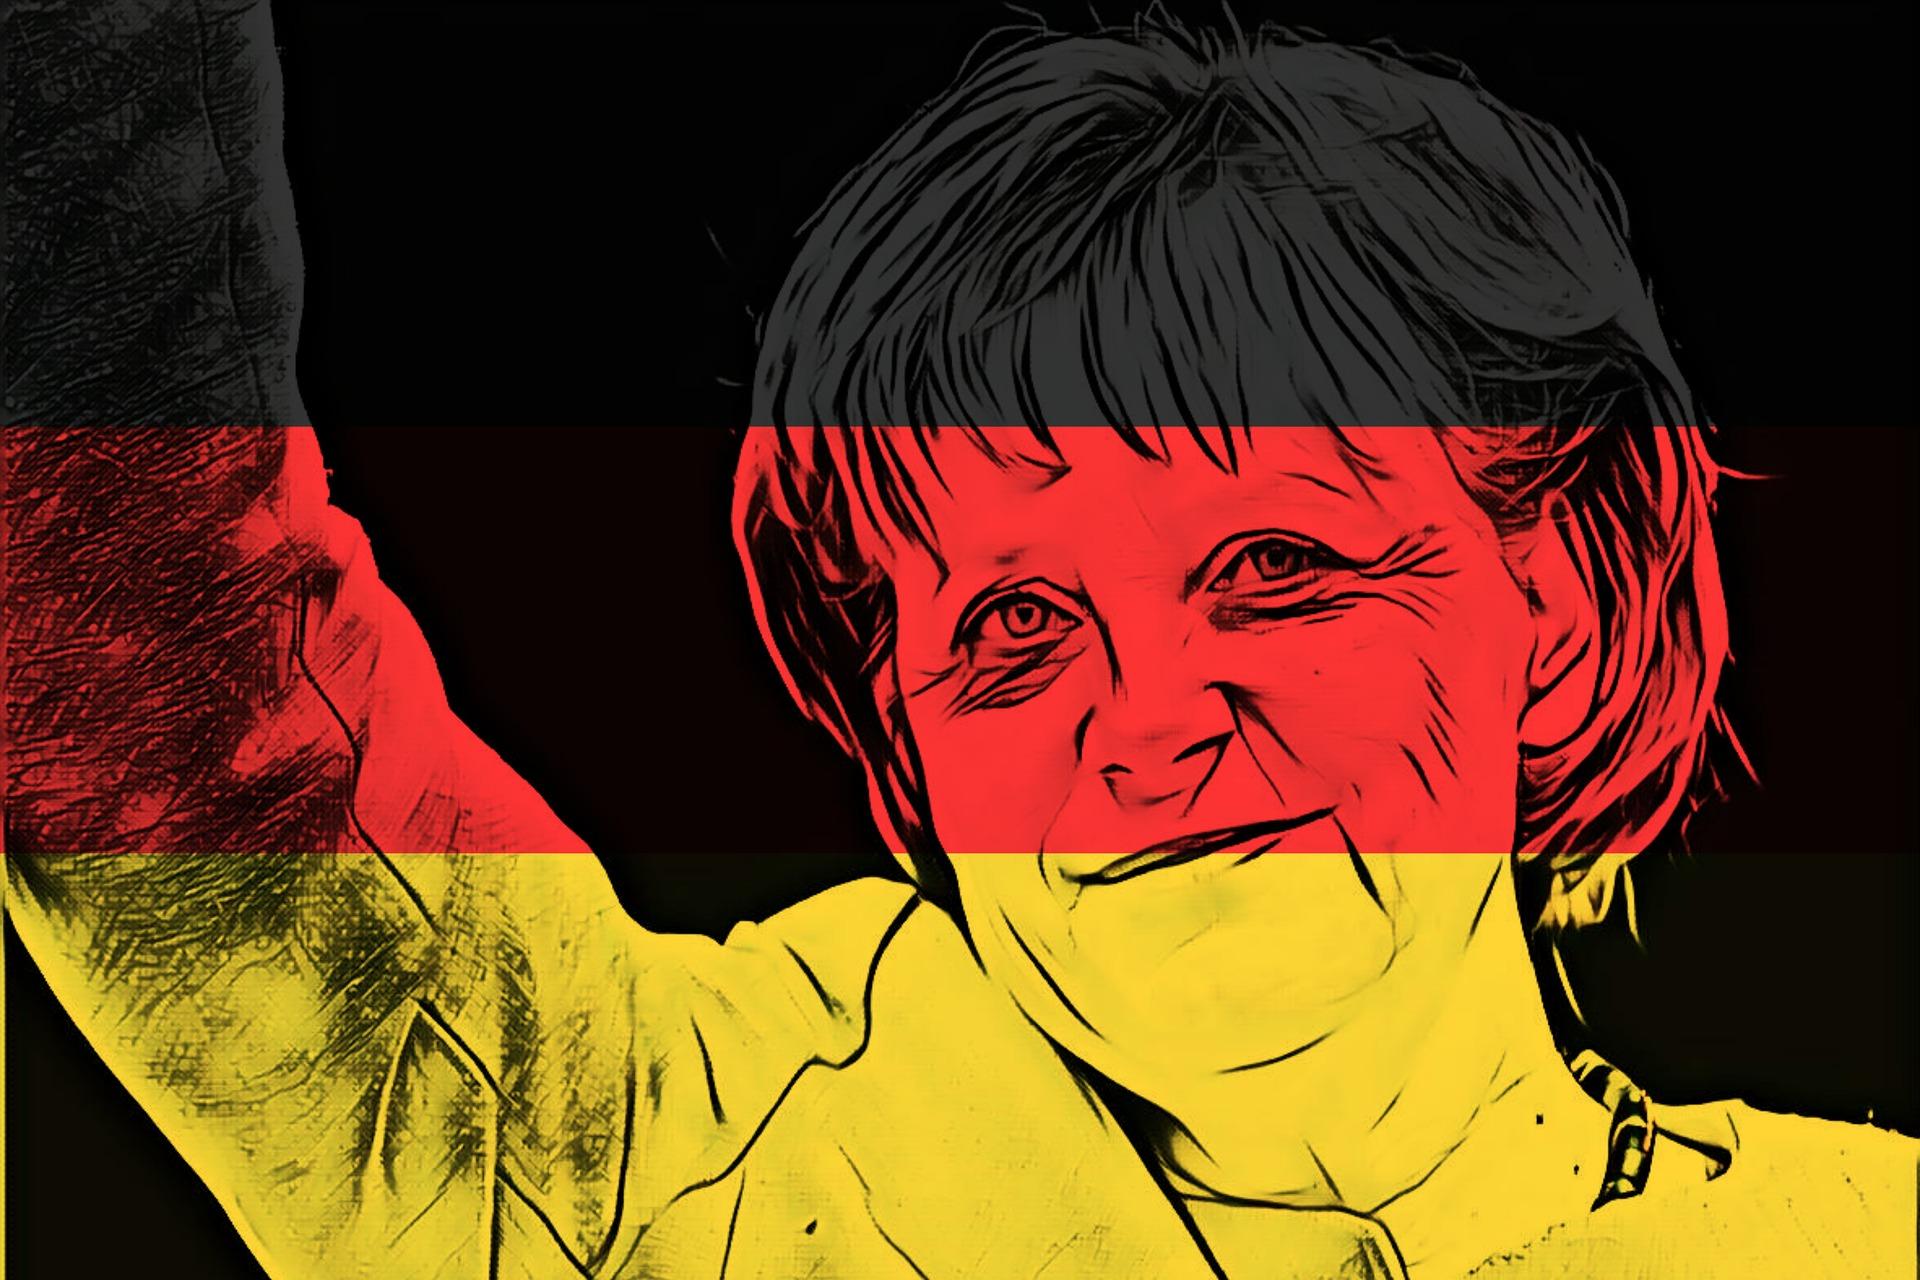 L'addio di Angela Merkel